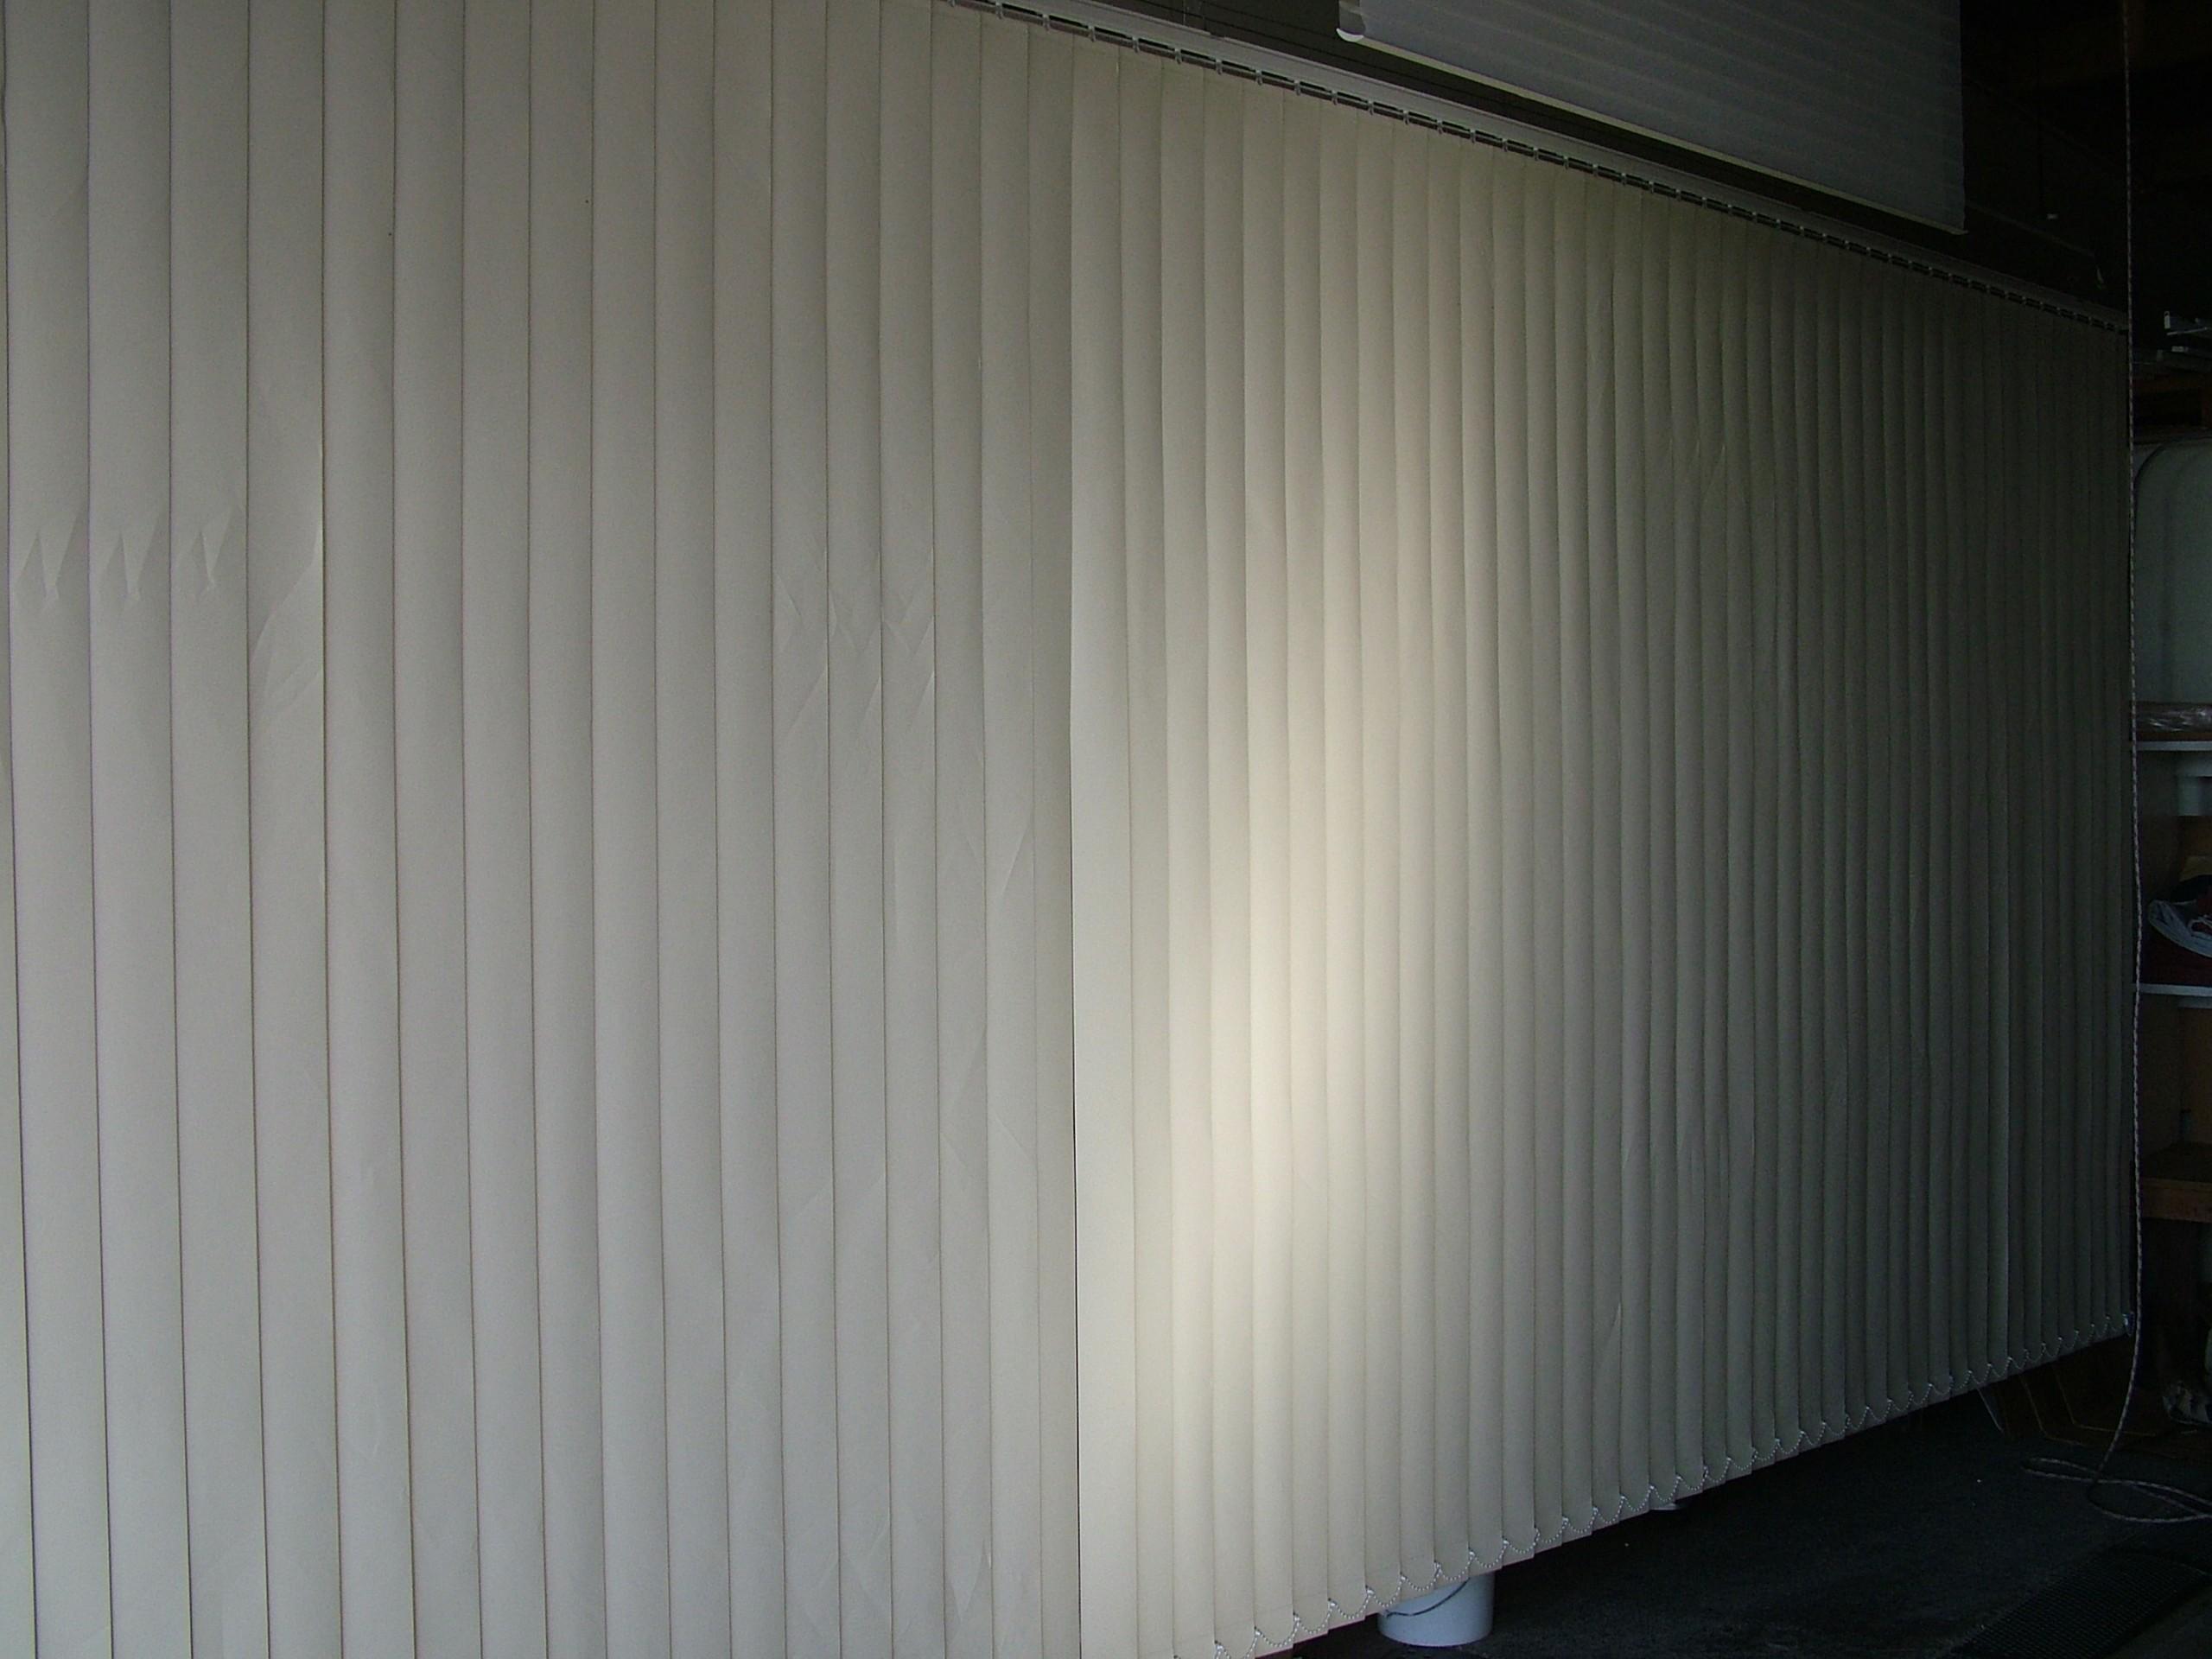 best horizontal parts depot fabulous home levolor shade to sale fixing curtains idea how brackets roman blinds com blind hunter fix douglas venetian for